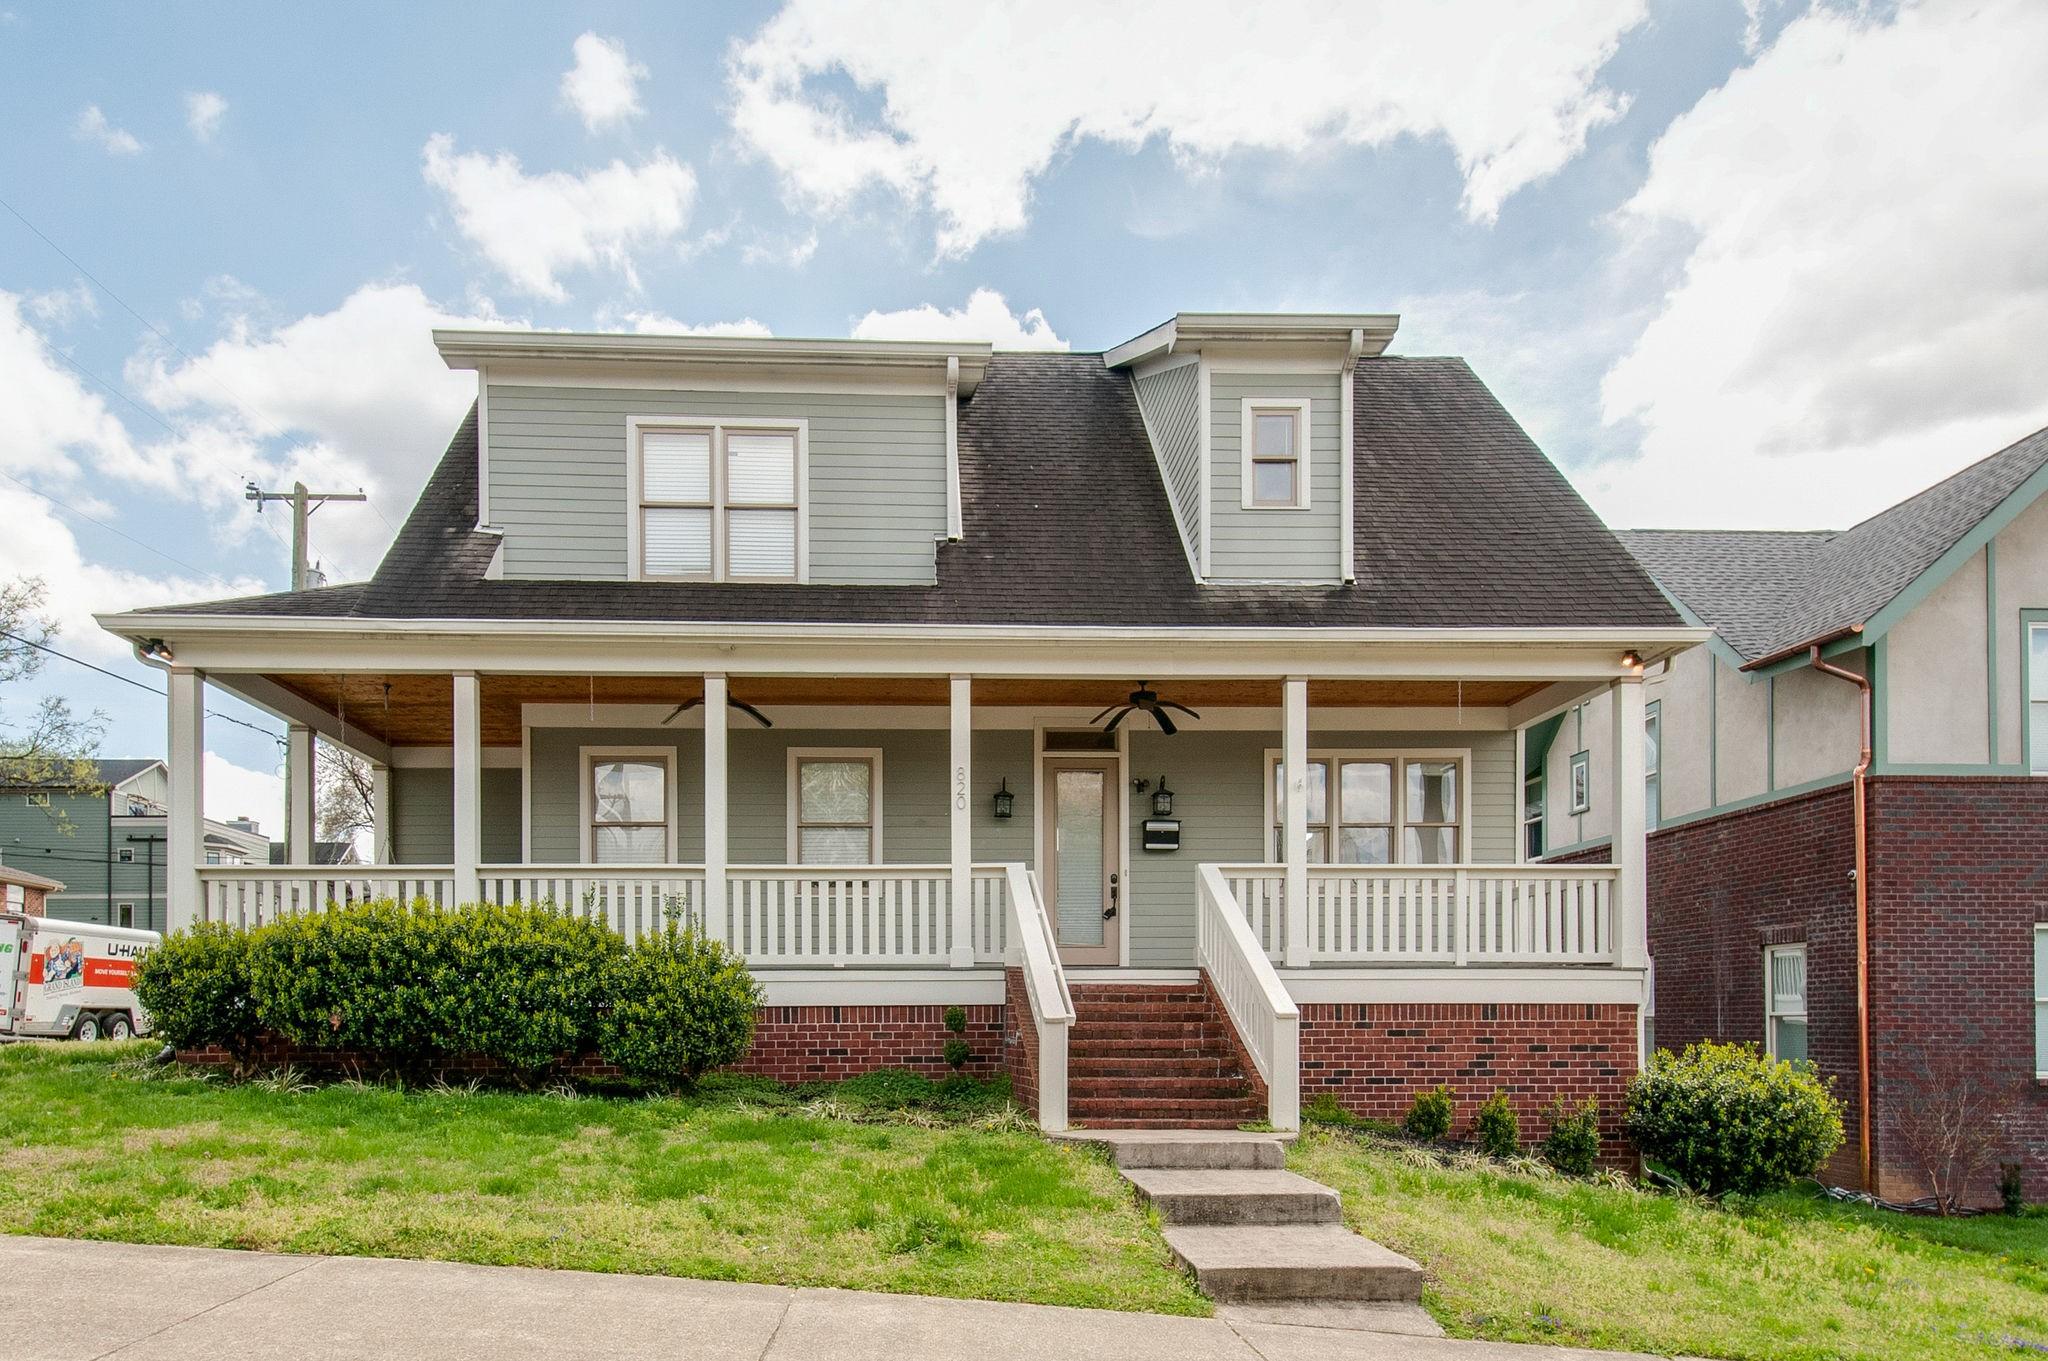 820 Shelby Ave, Nashville, TN 37206 - Nashville, TN real estate listing